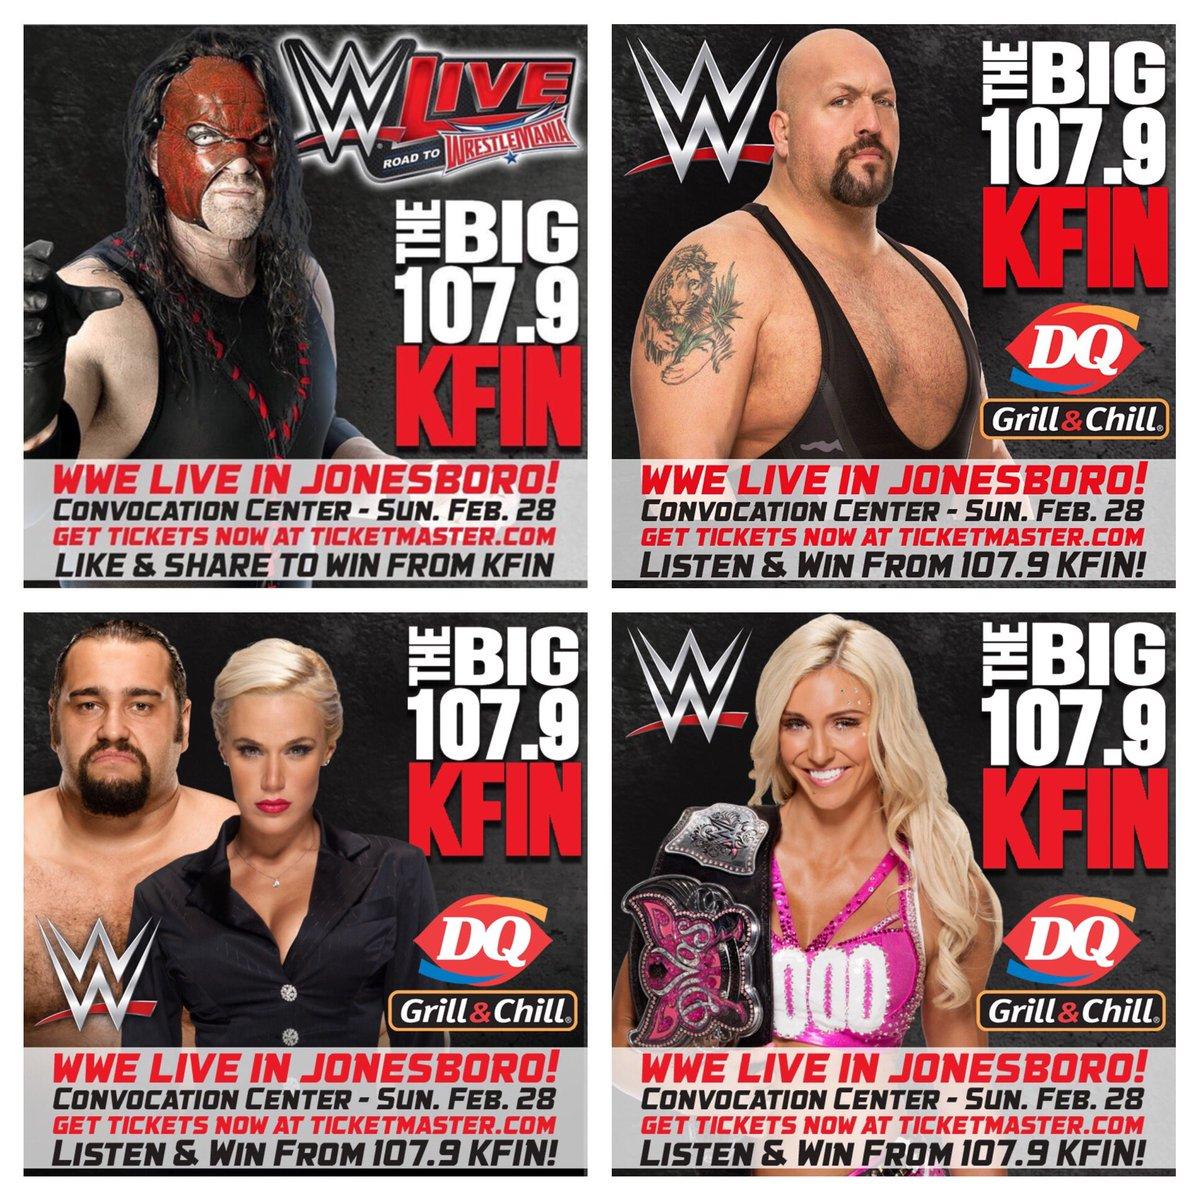 #KFIN Country, #WWEJonesboro is tonight @asuconvo! Bell time is 5PM. Tix: https://t.co/DRrskuK4qq #BB1079 @1079KFIN https://t.co/ViZdUH8kTK